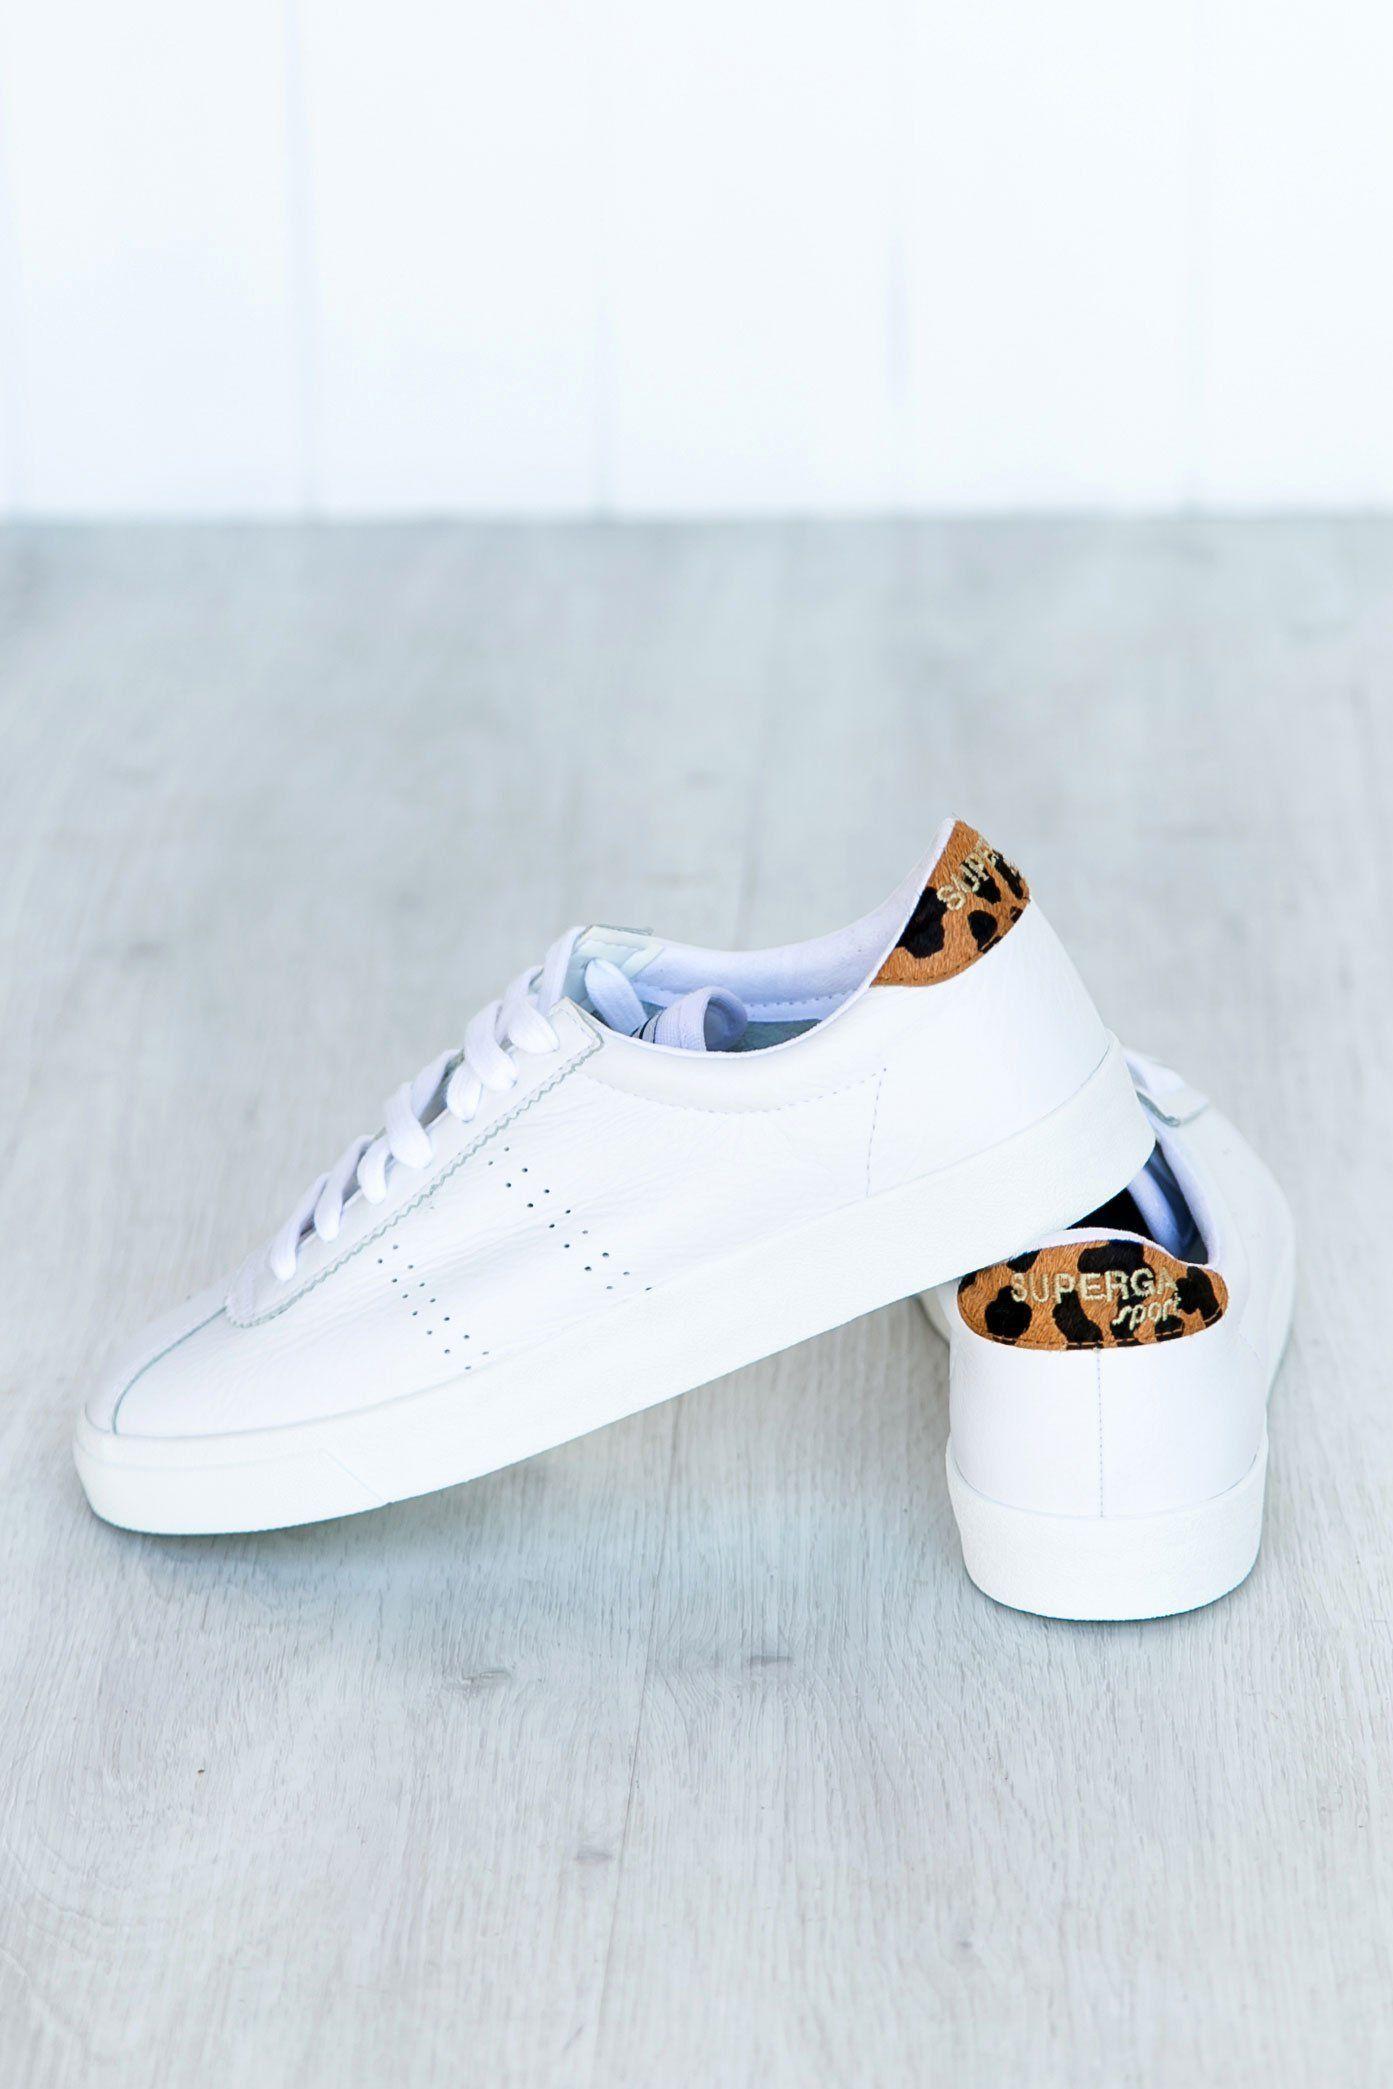 Superga 2843 Sport Club Sneakers